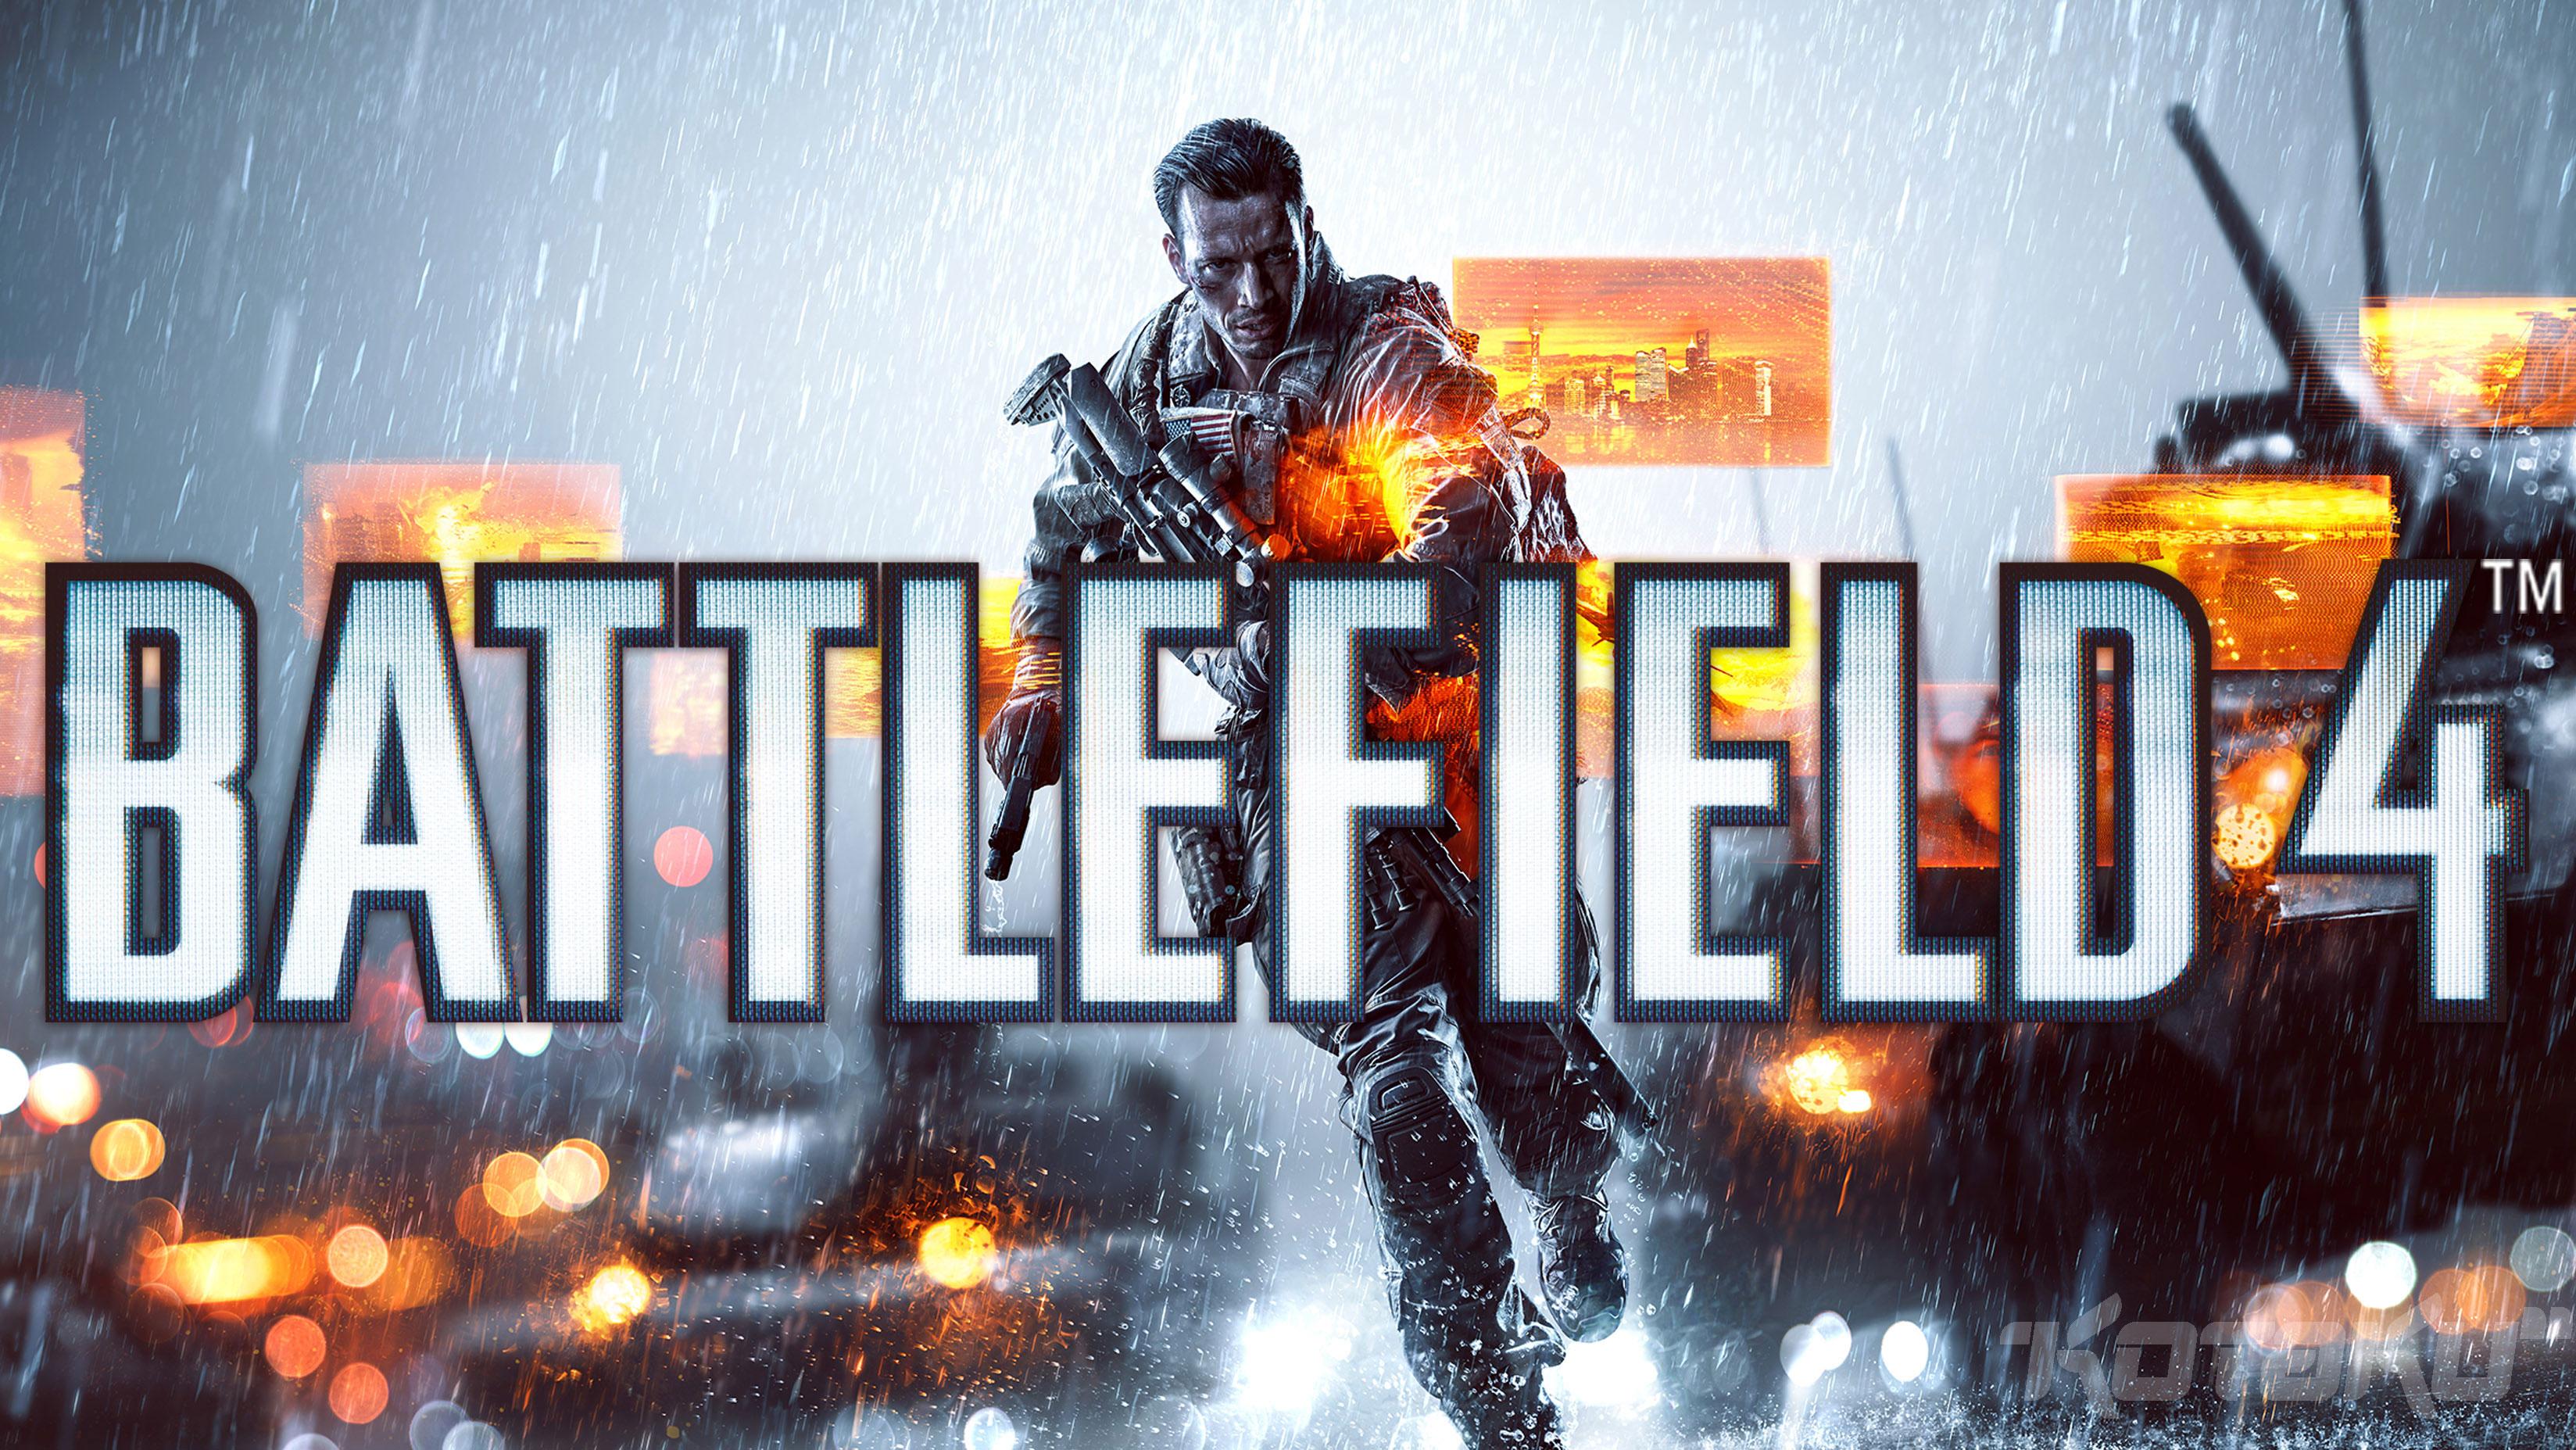 Battlefield 4 PC Origin.Cambiar Idioma Ruso/Polaco a Españo